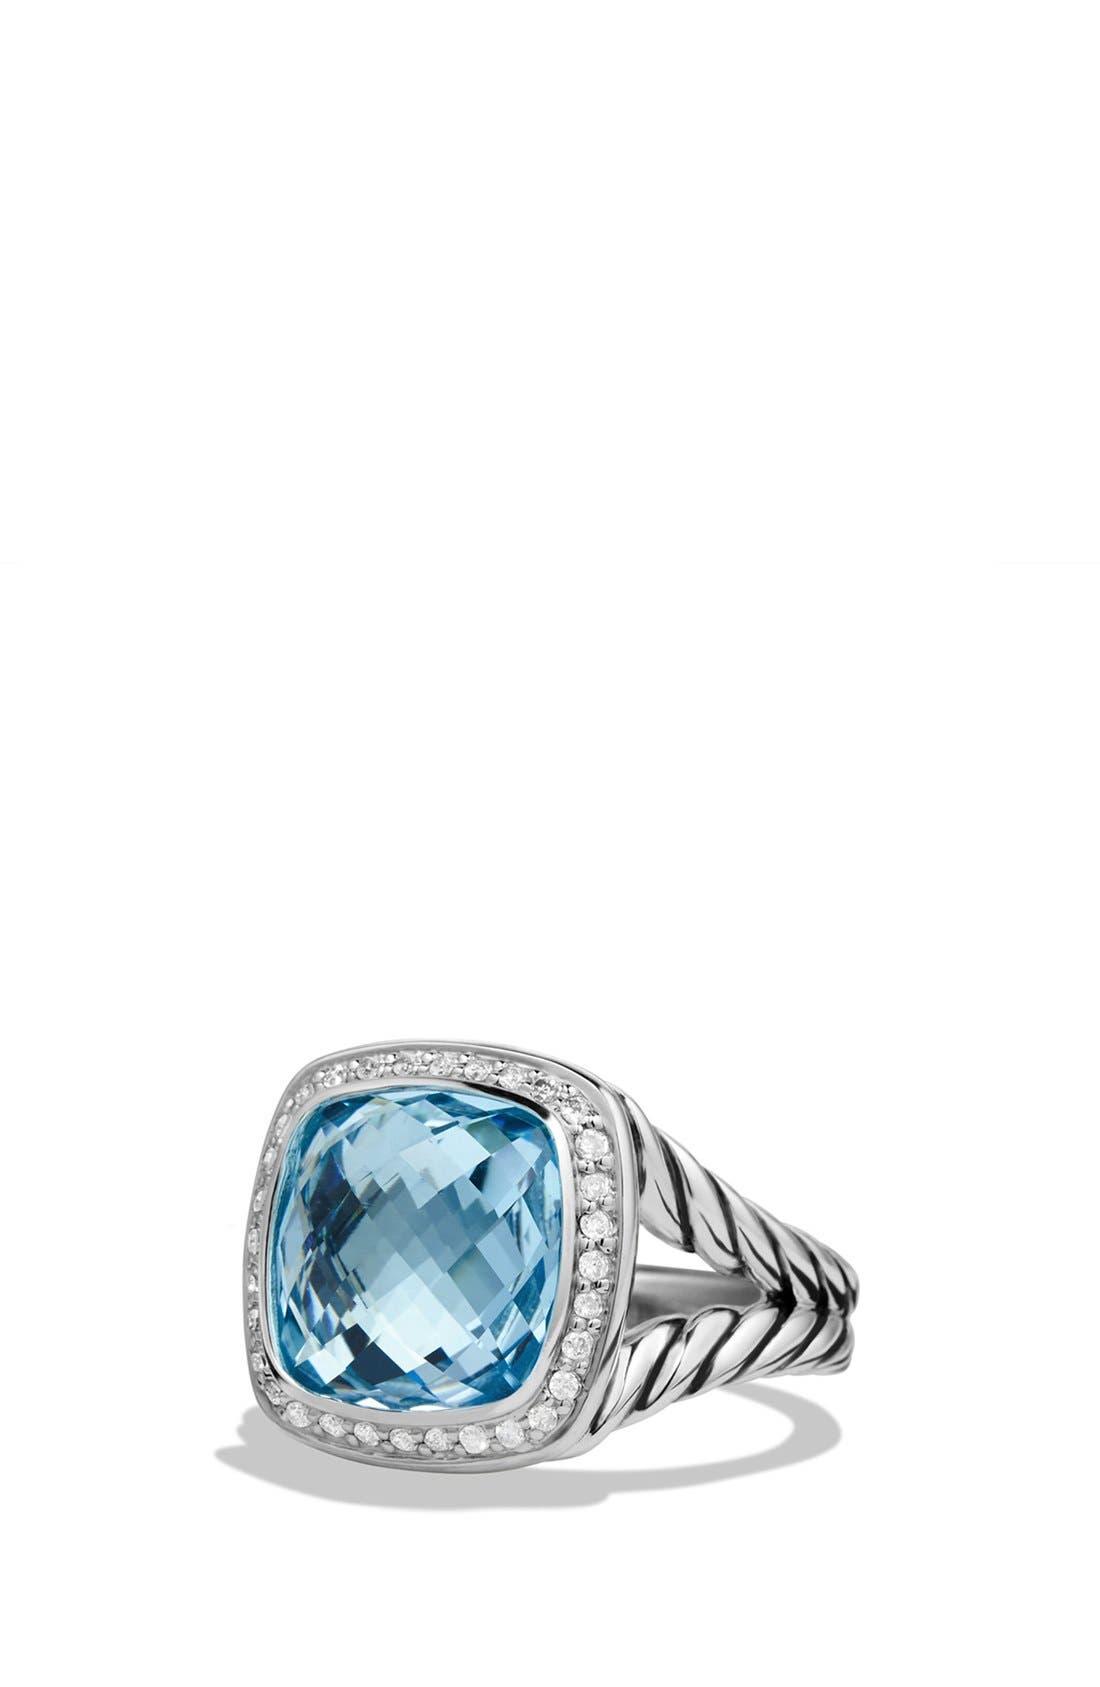 DAVID YURMAN 'Albion' Ring with Semiprecious Stone and